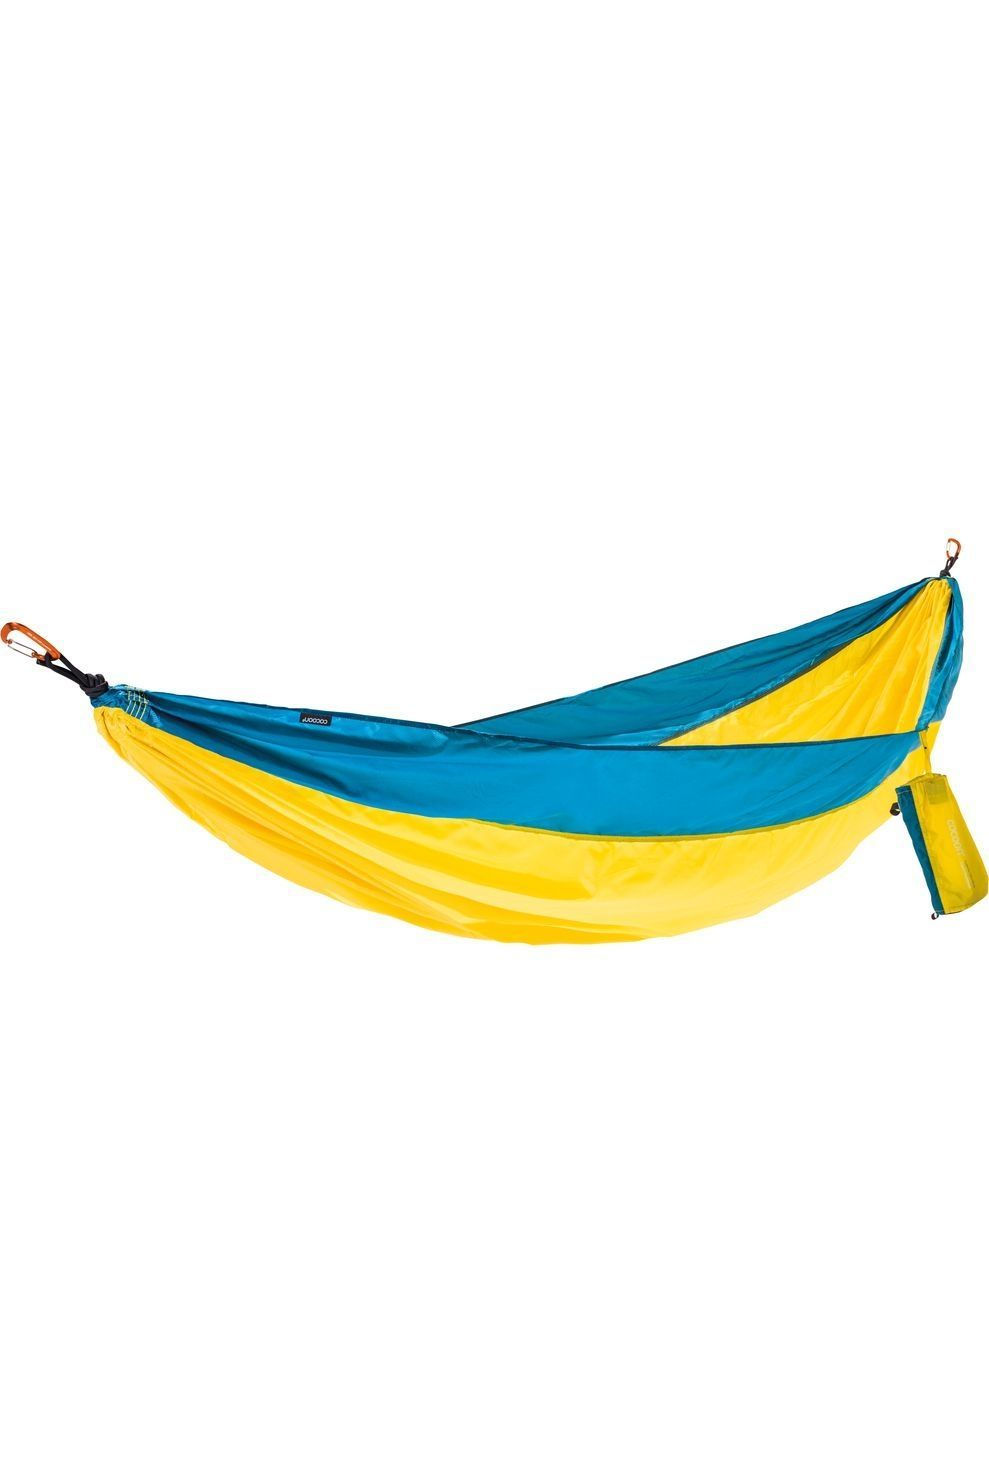 Cocoon Hangmat 2-Person Hammock - Geel